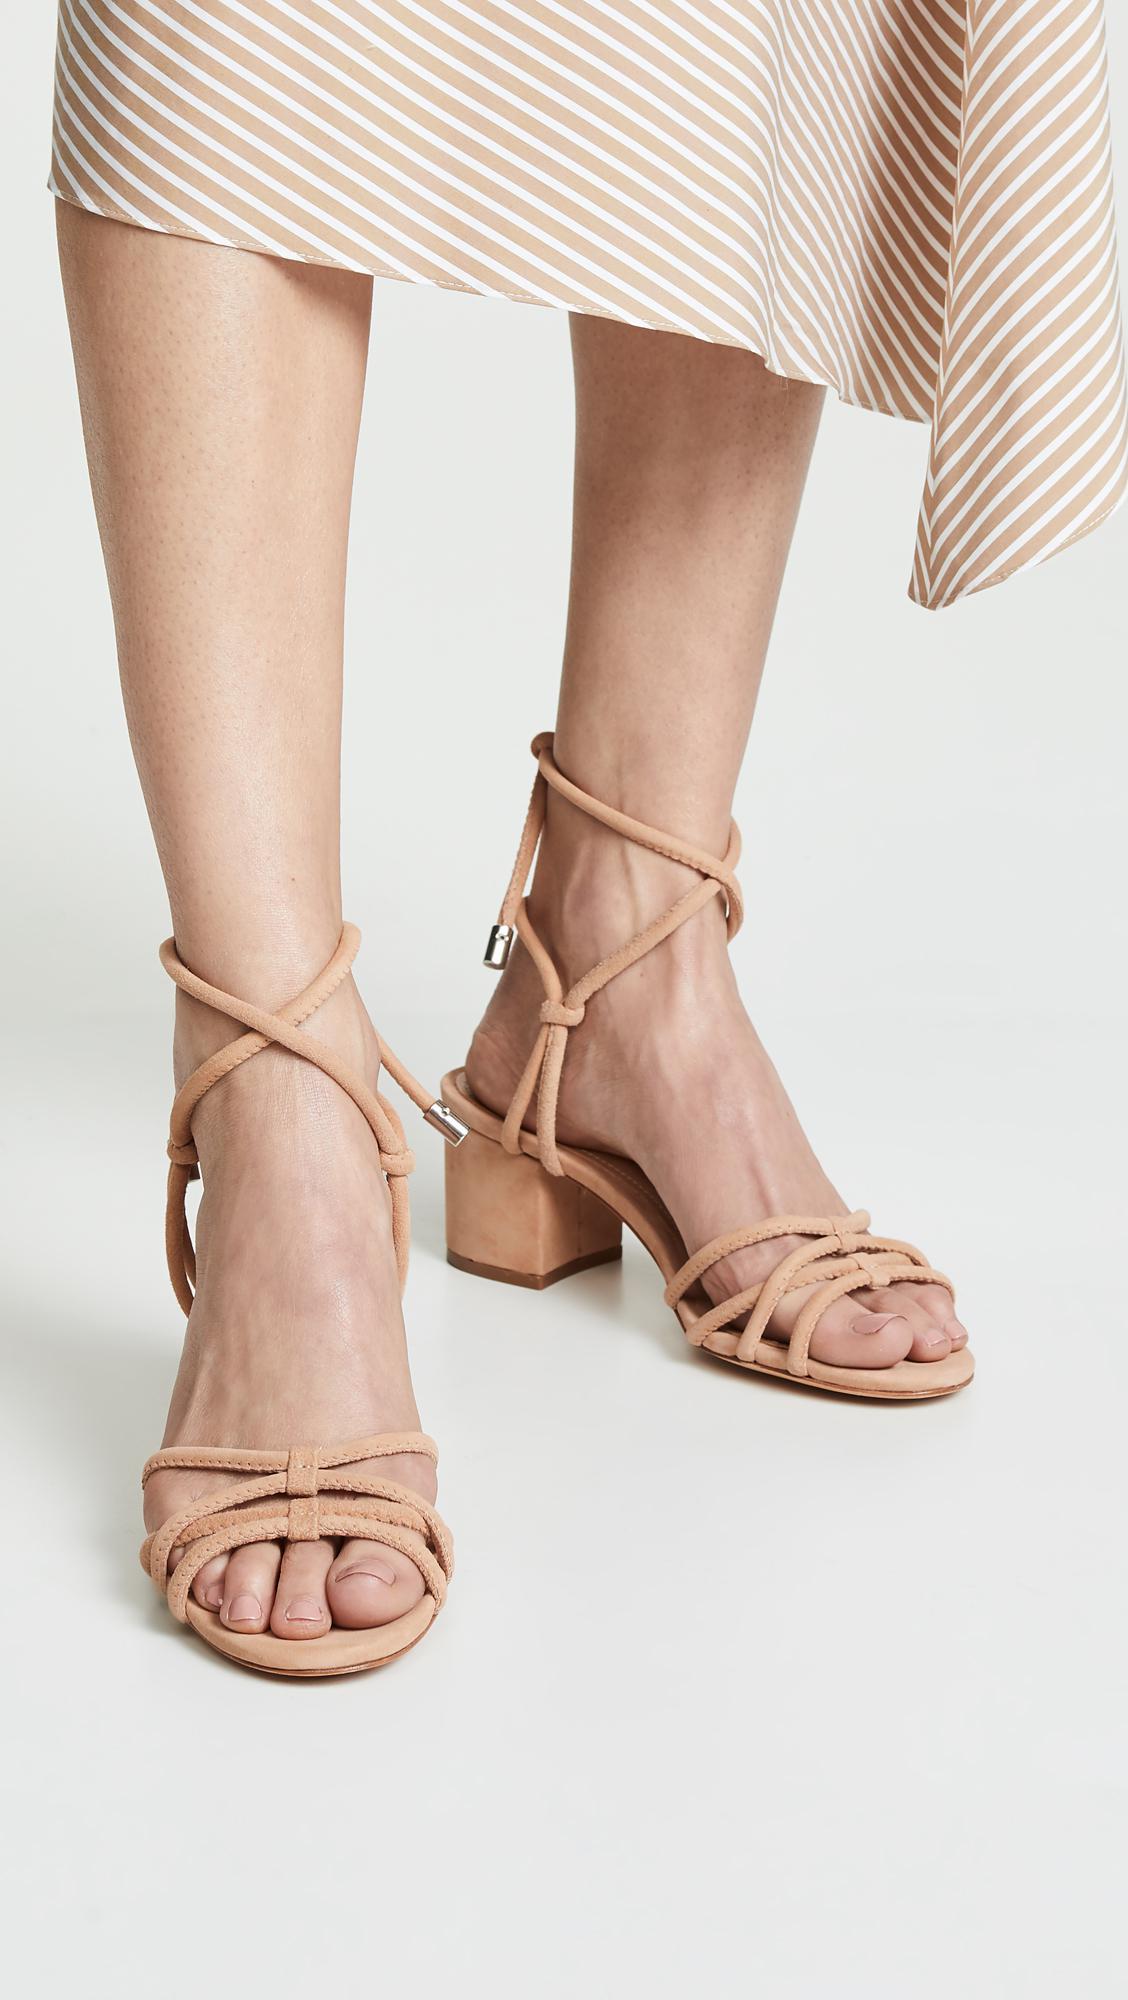 Schutz Leather Marcella Strappy Sandals